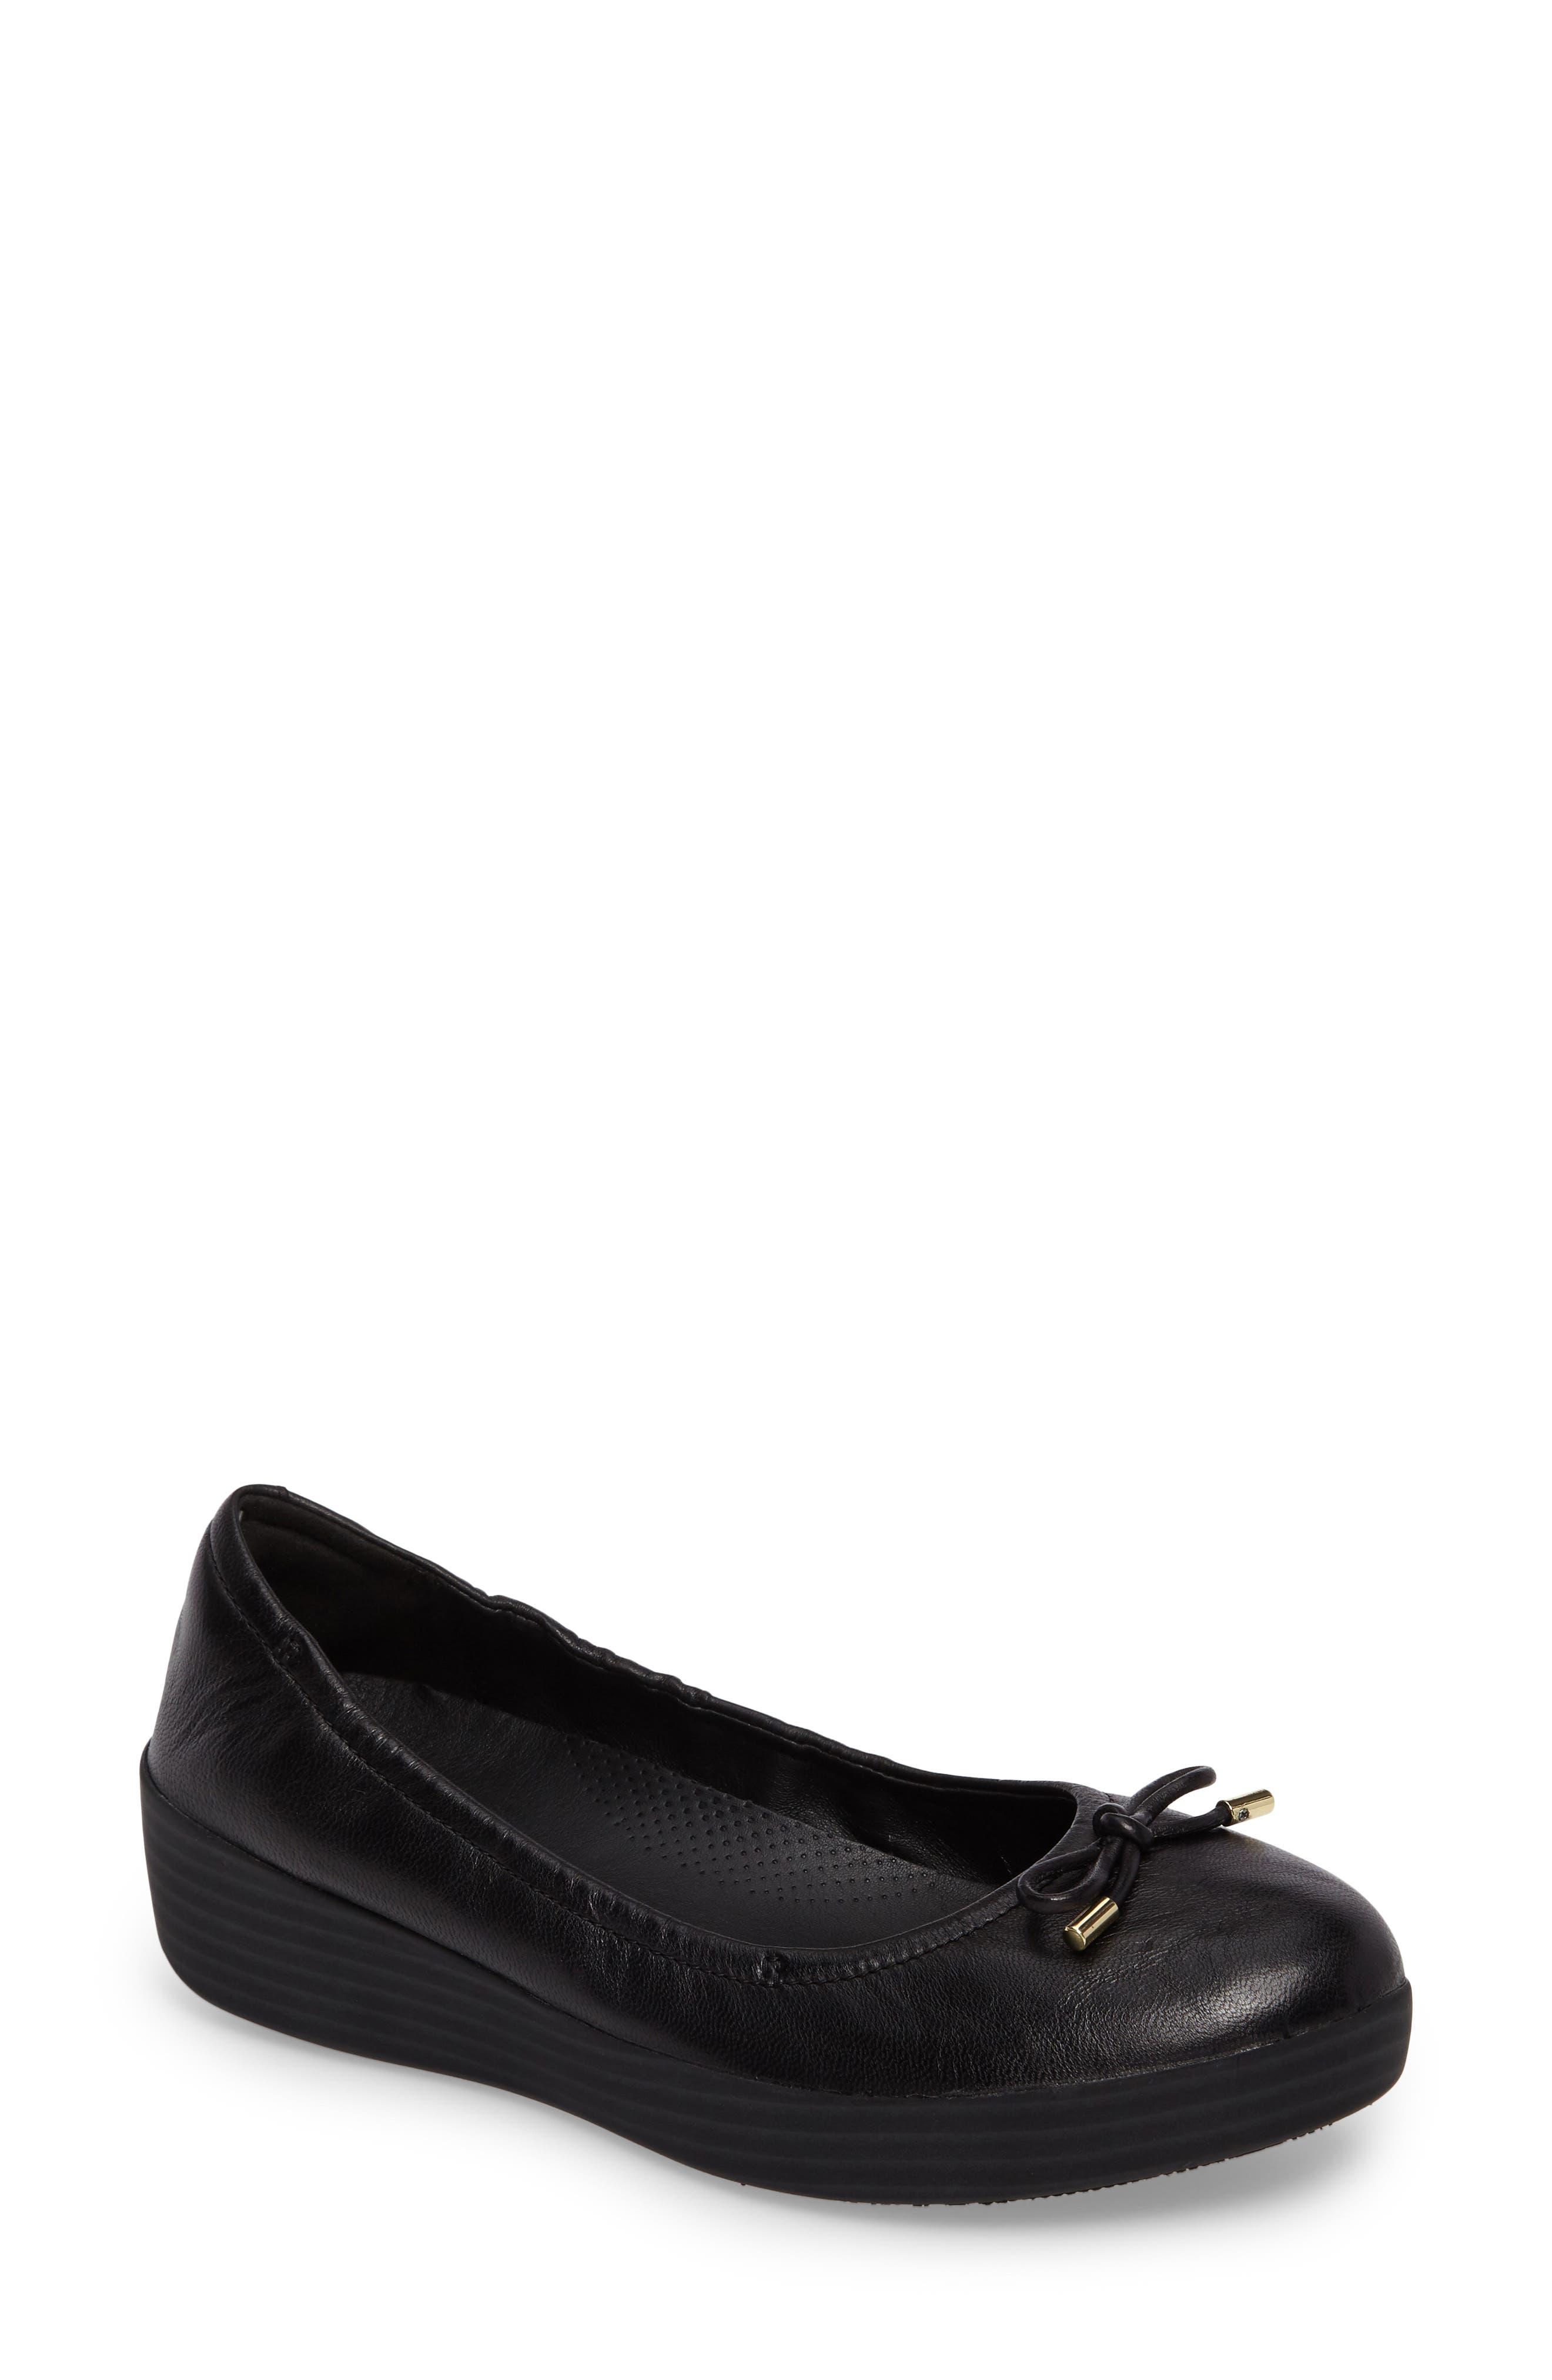 2254b8595c9b Fitflop Superbendy Ballerina Flat In Black Leather